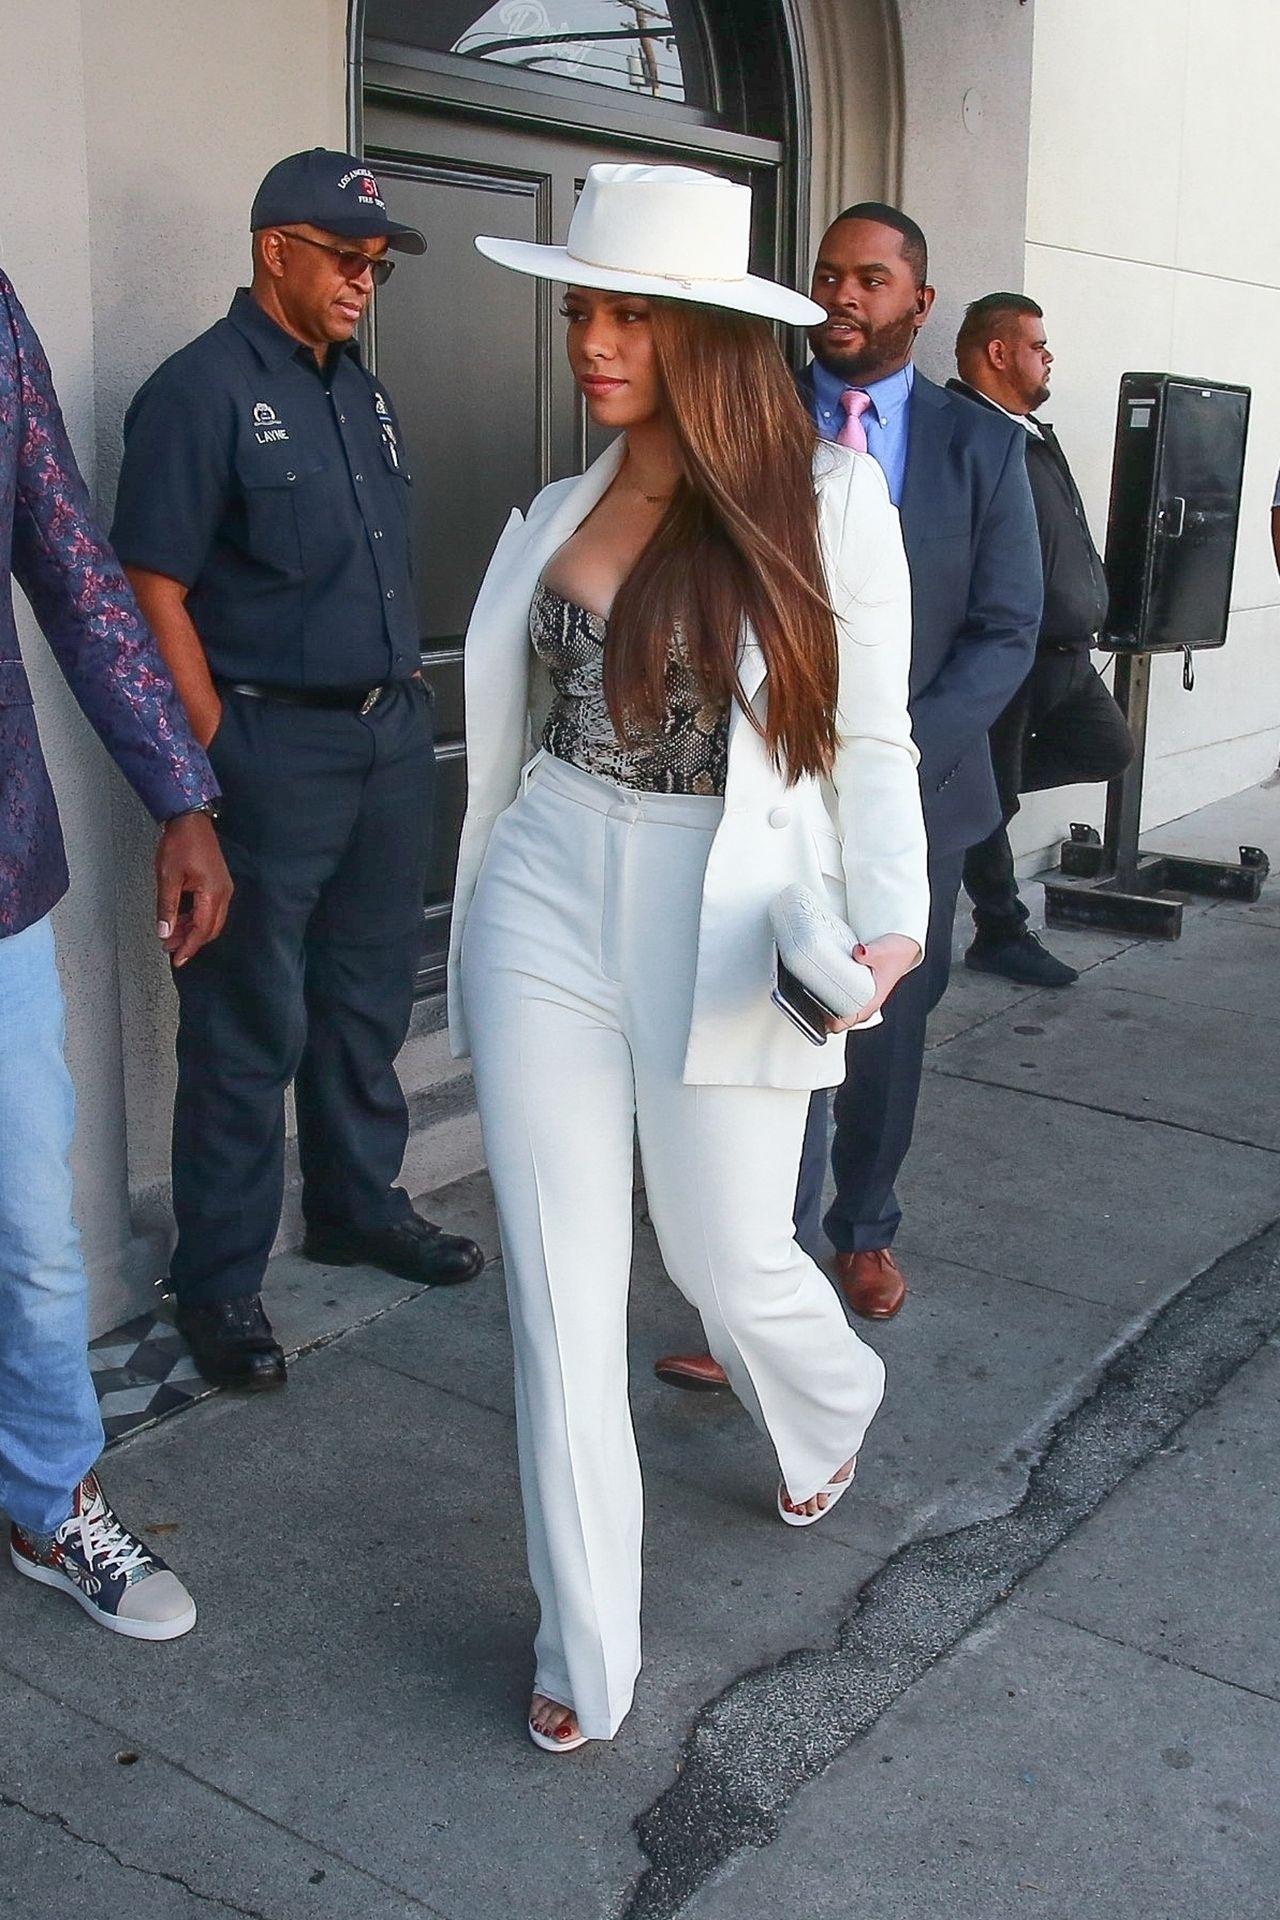 Dinah Jane Departs The Women In Harmony Pre Grammy Luncheon 0002